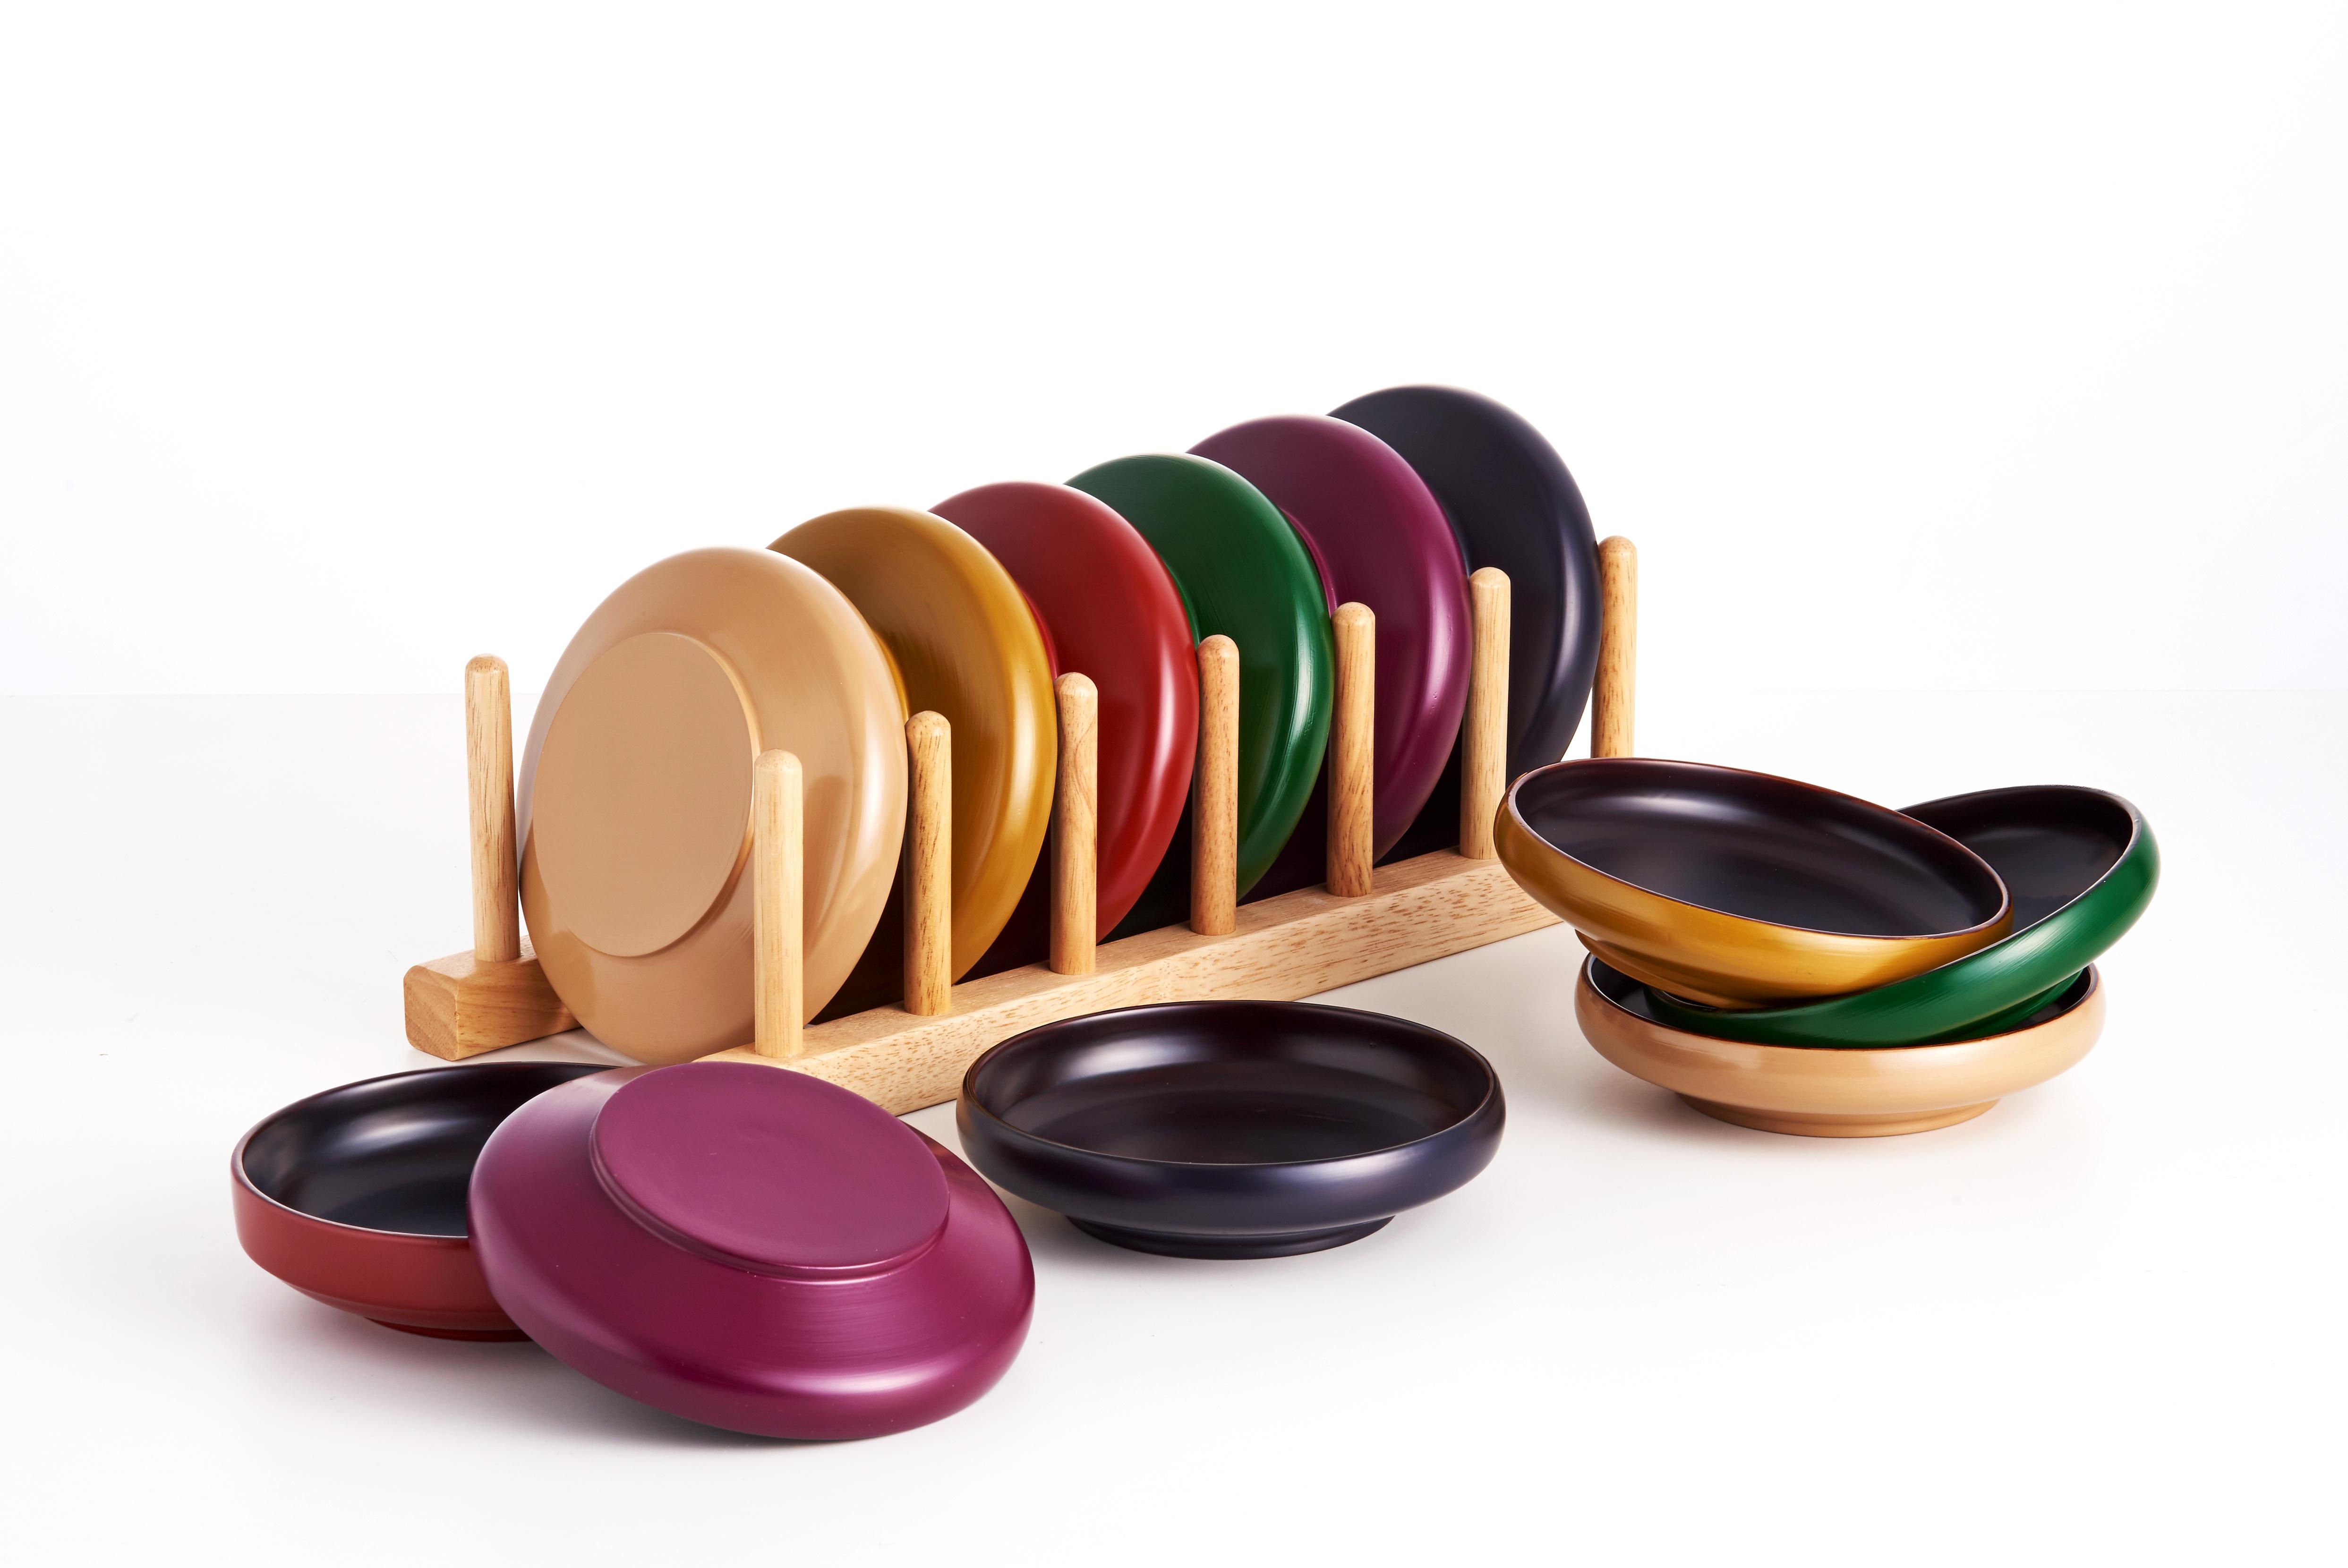 ottchil 6color dishs